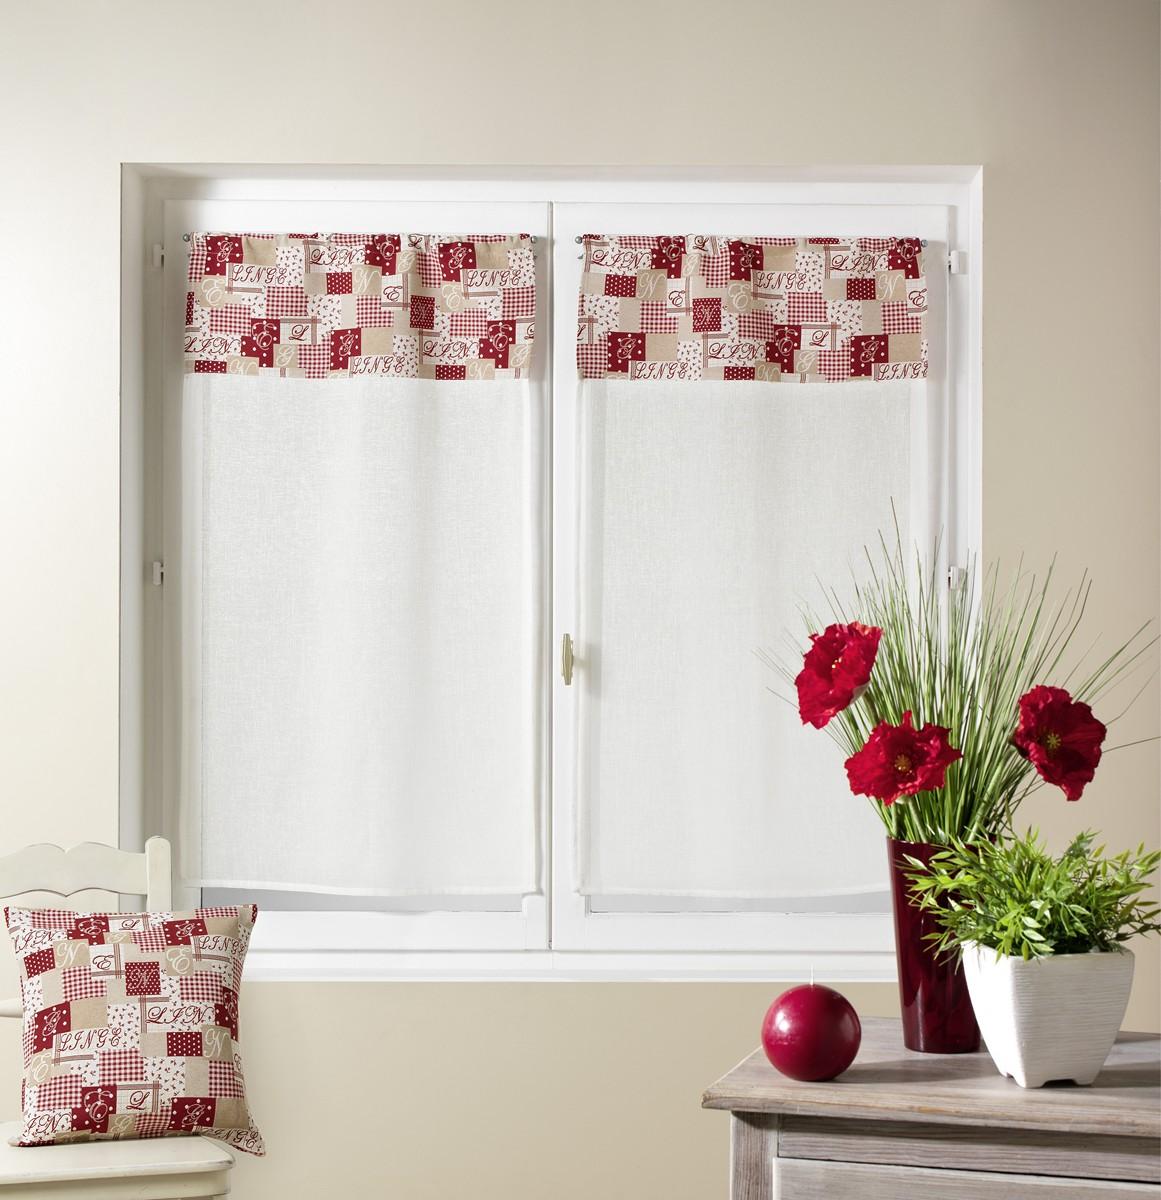 peque os visillos en estame a patchwork topo cortina casa venta en l nea de el par de. Black Bedroom Furniture Sets. Home Design Ideas